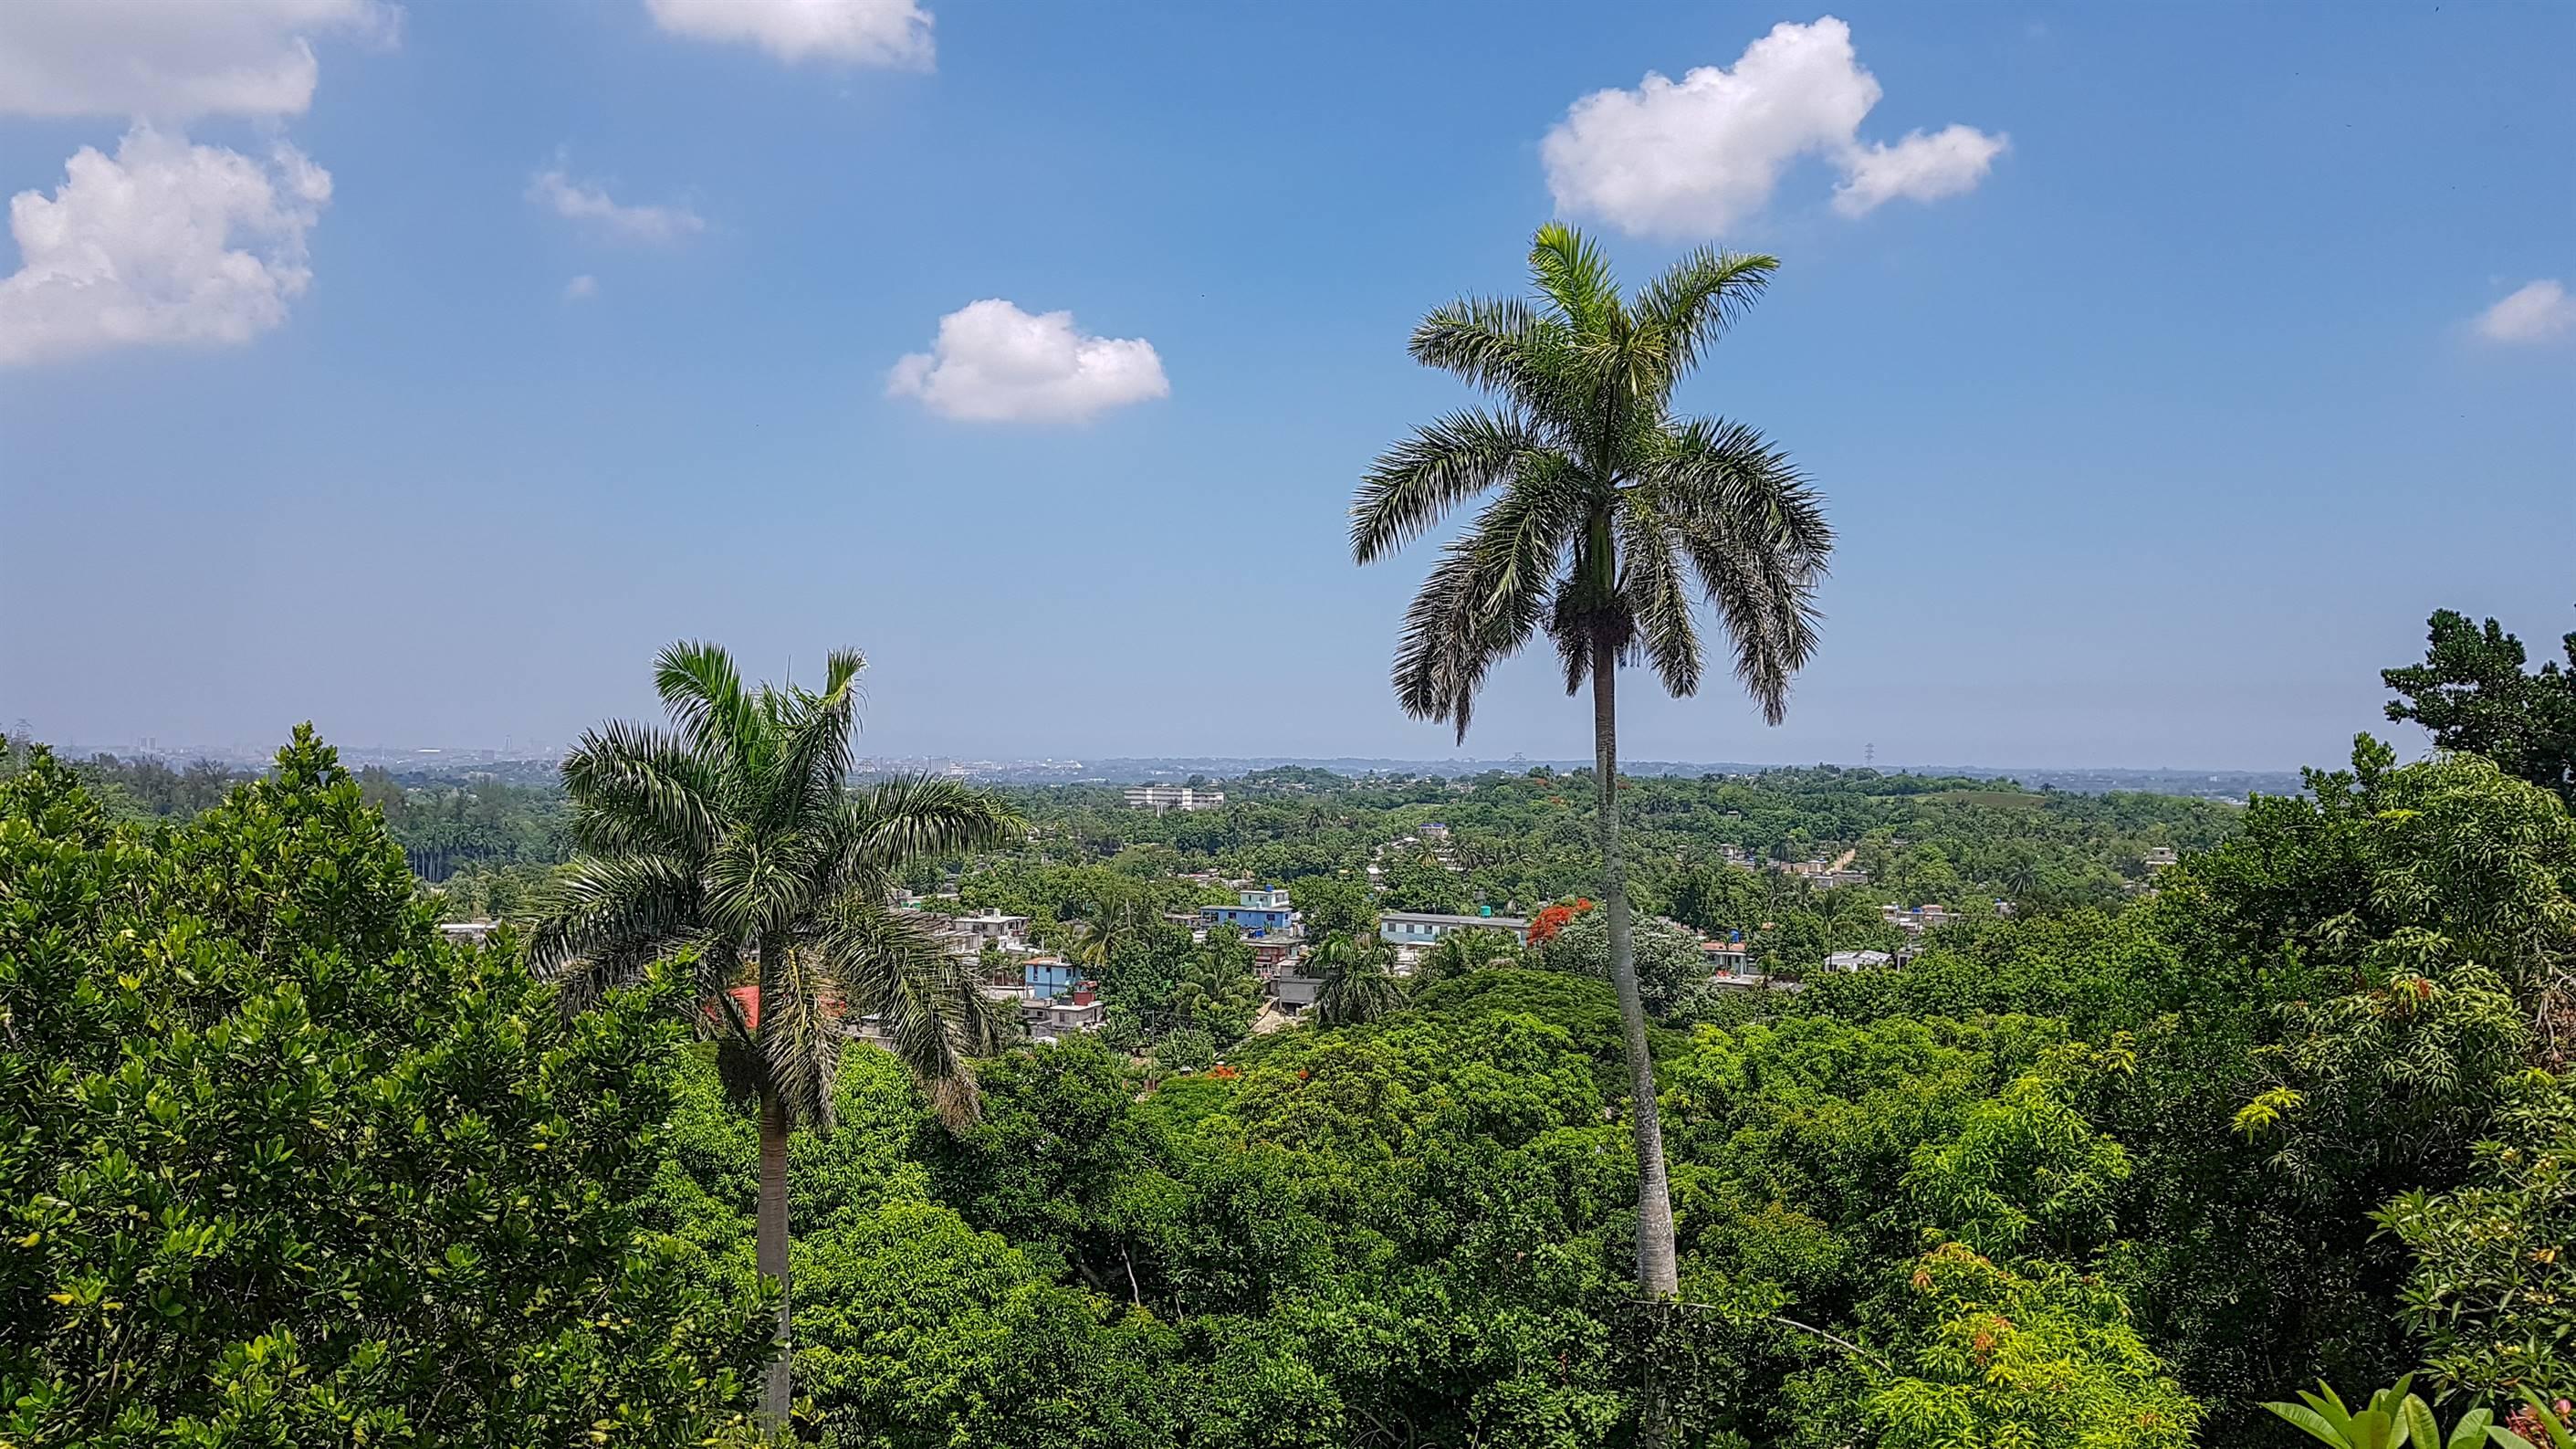 Finca Vigia, Cuba